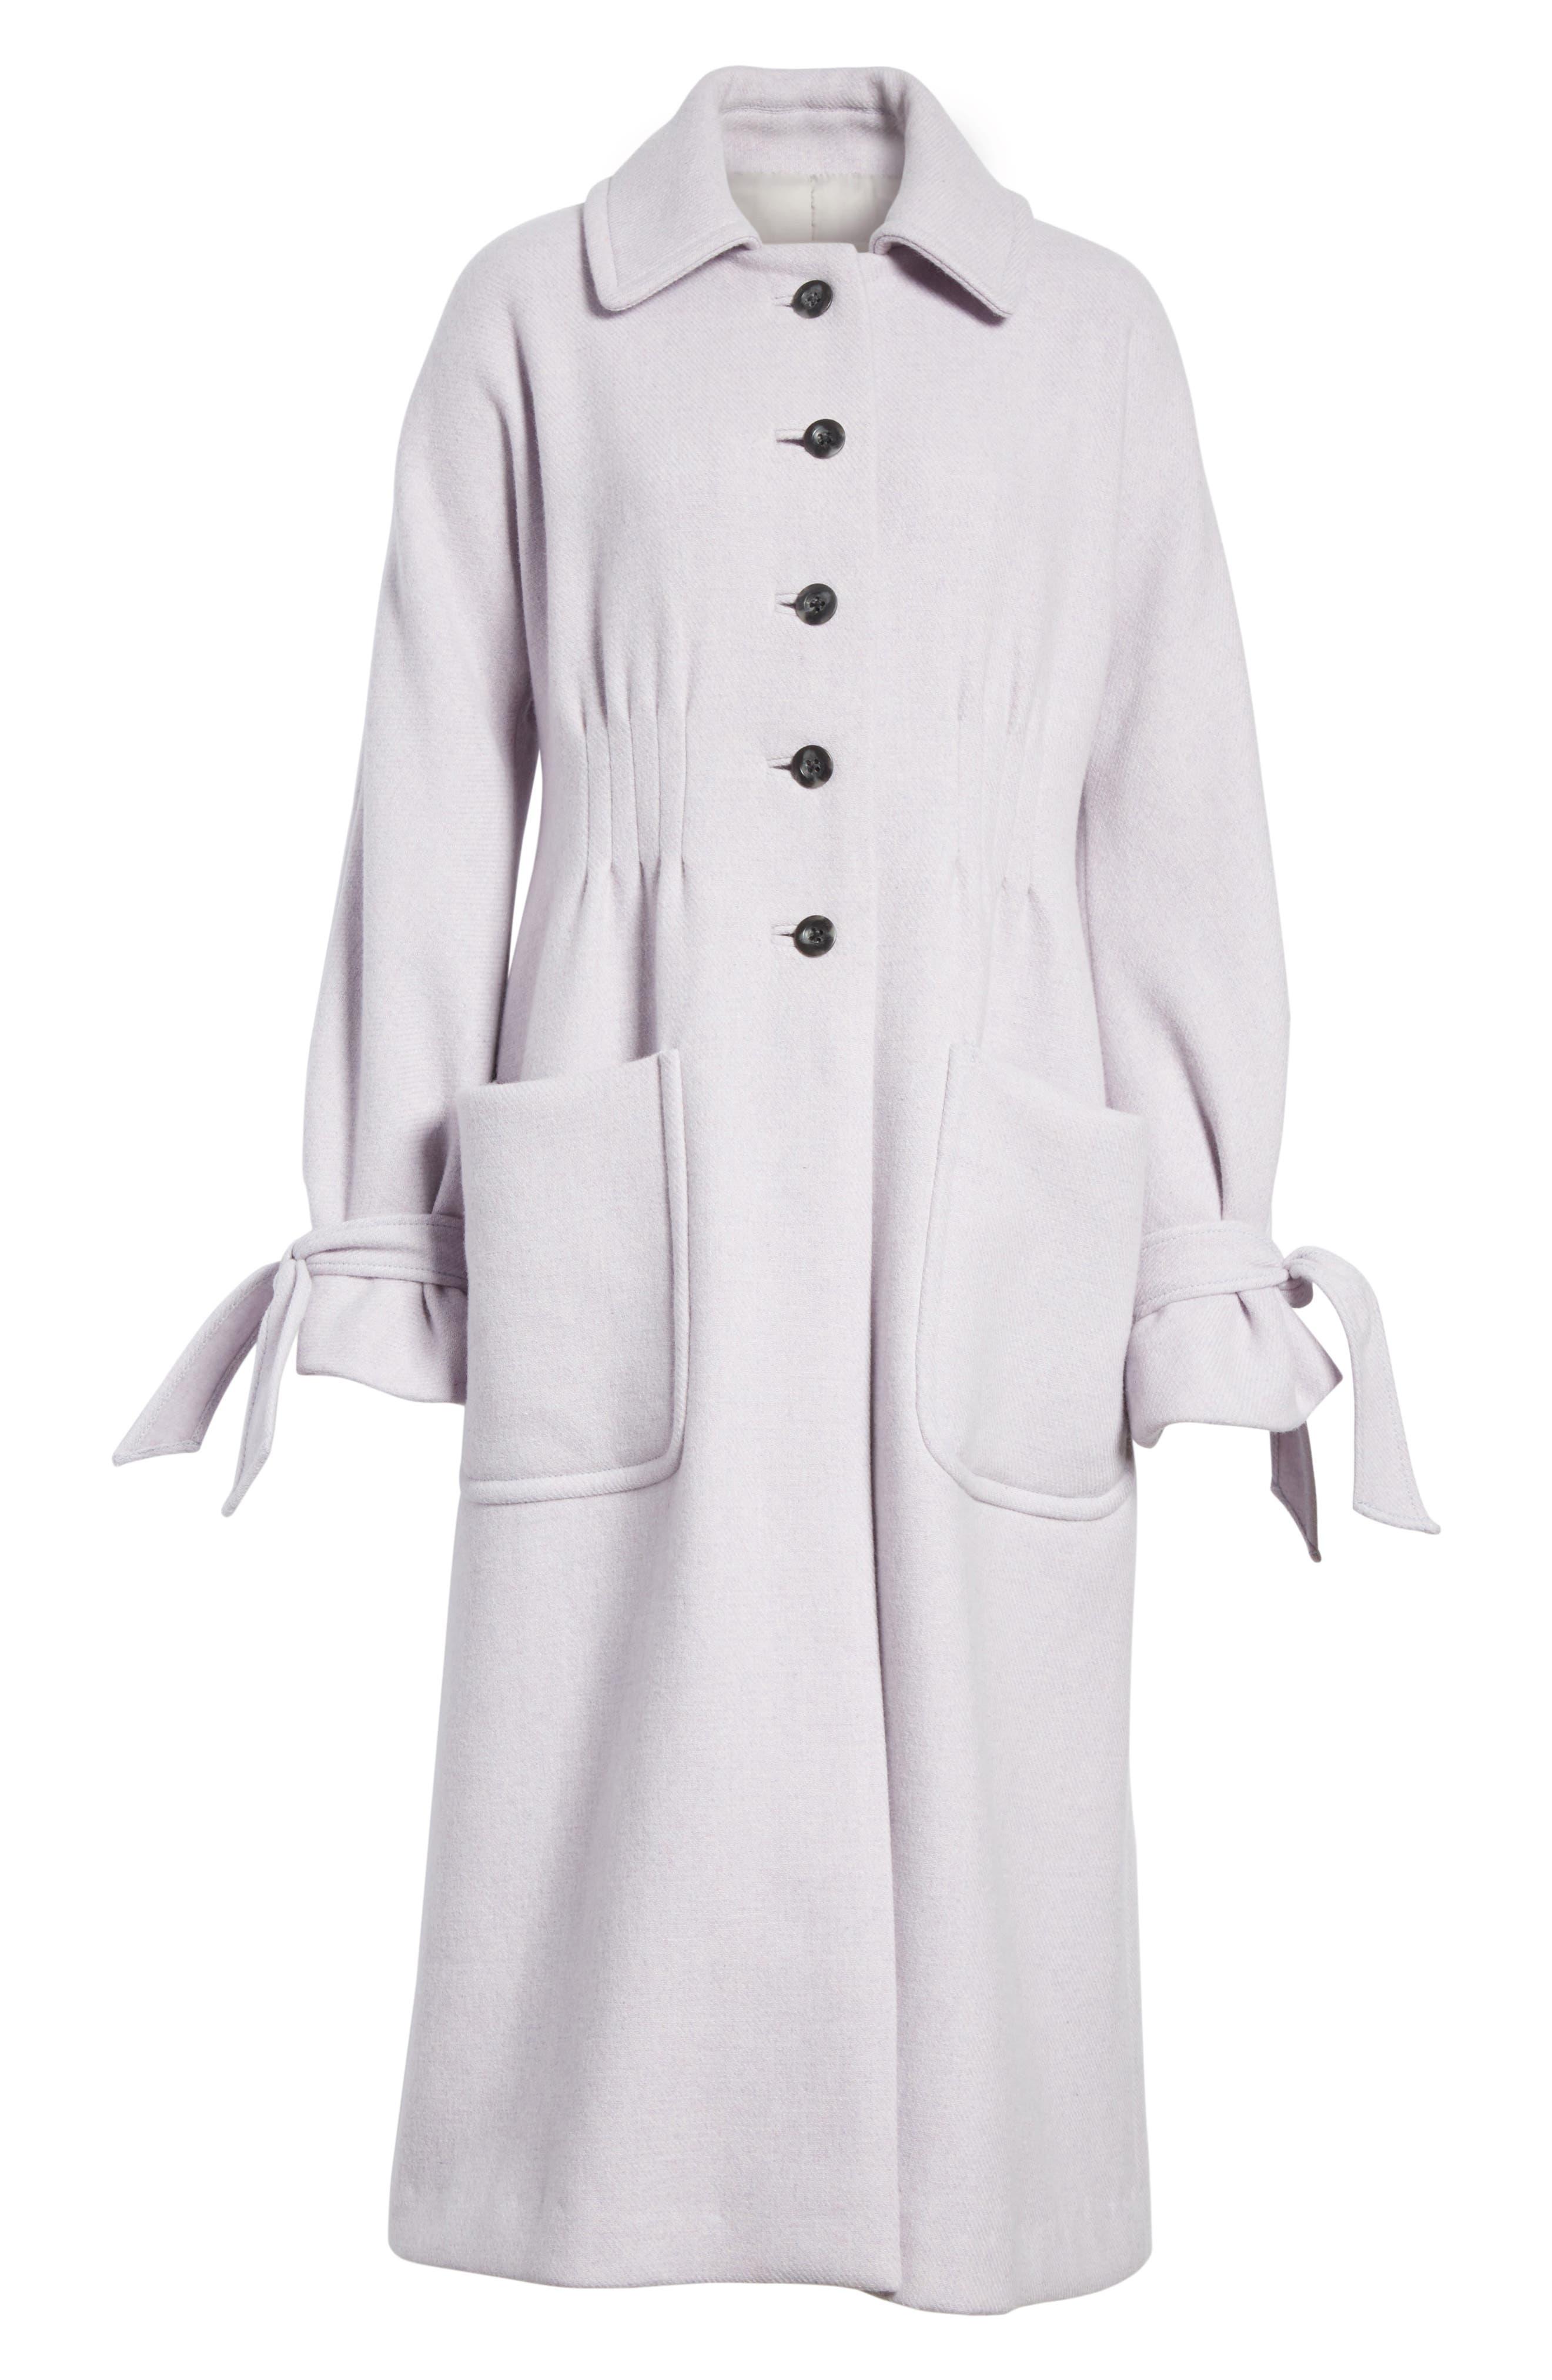 Wool Blend Melton Coat,                             Alternate thumbnail 6, color,                             Dusty Lavender